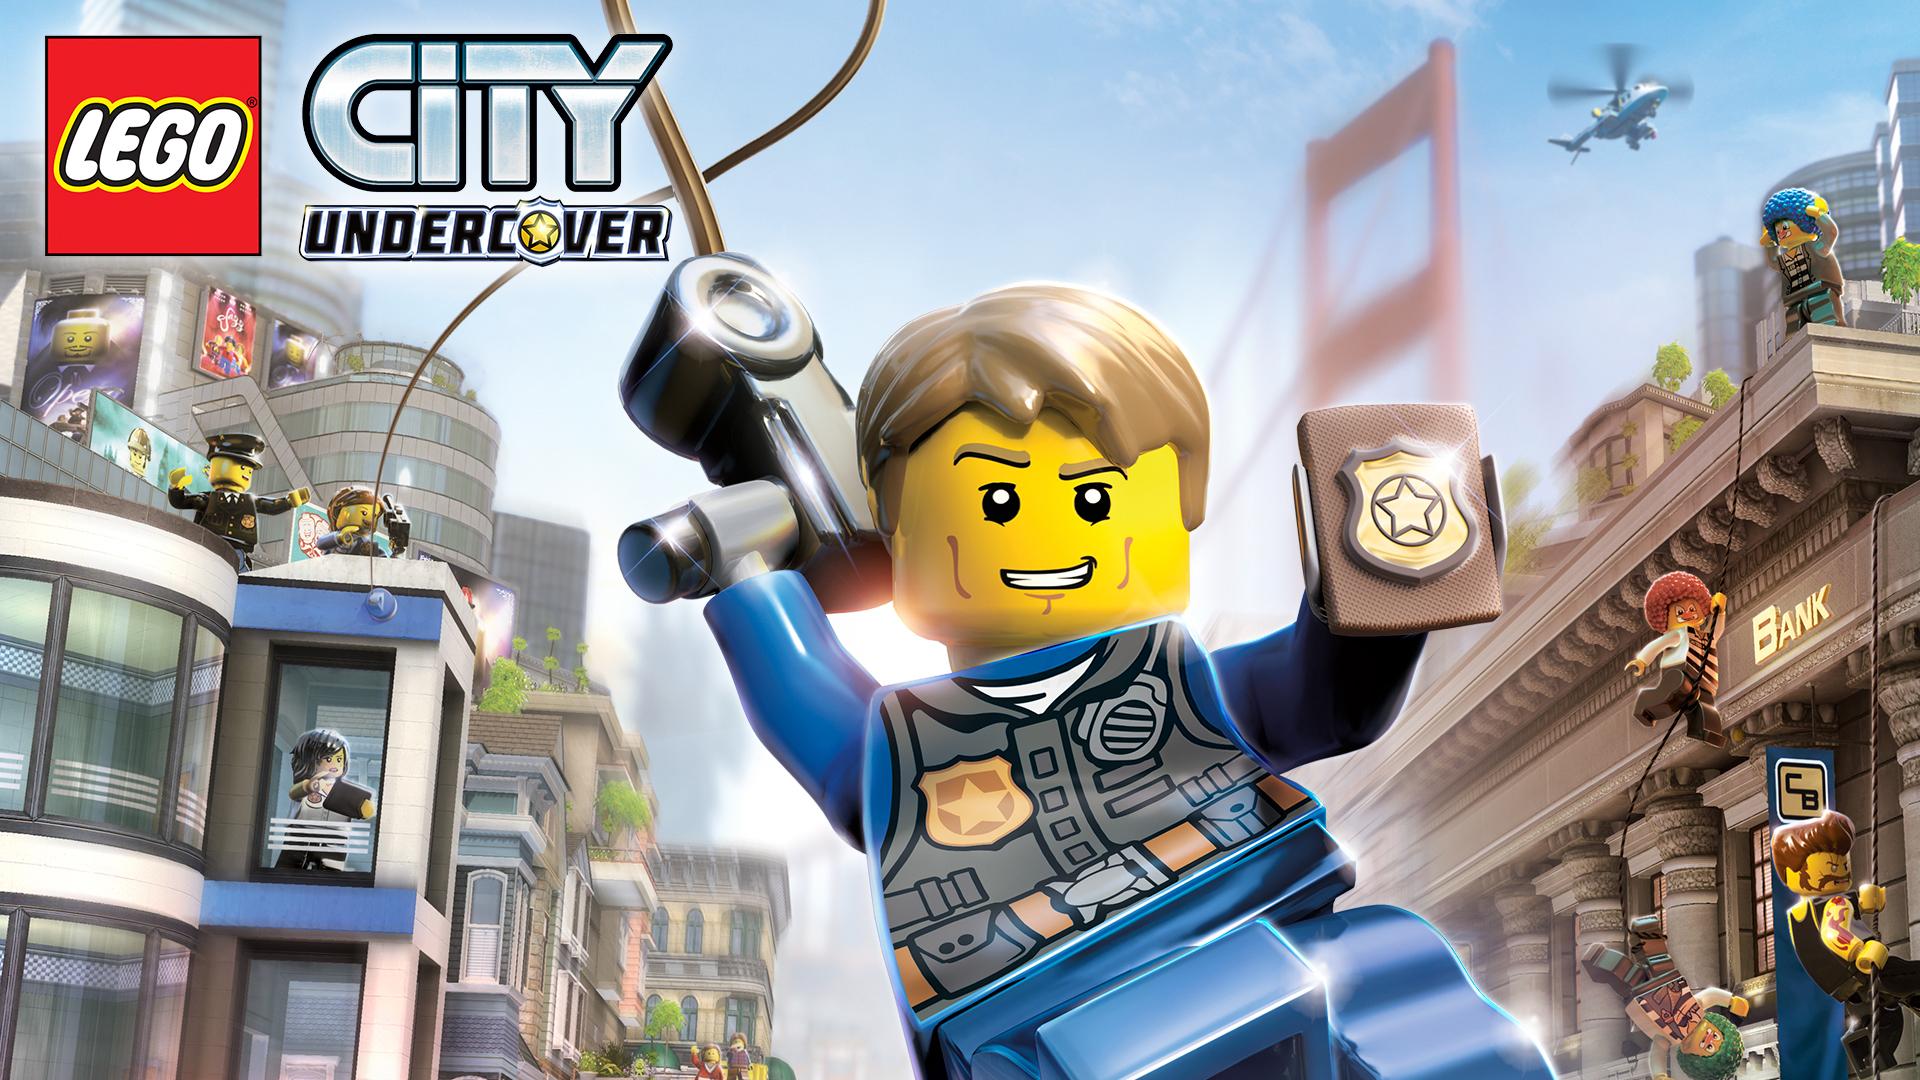 LEGO CITY UNDERCOVER (ESHOP EEUU)